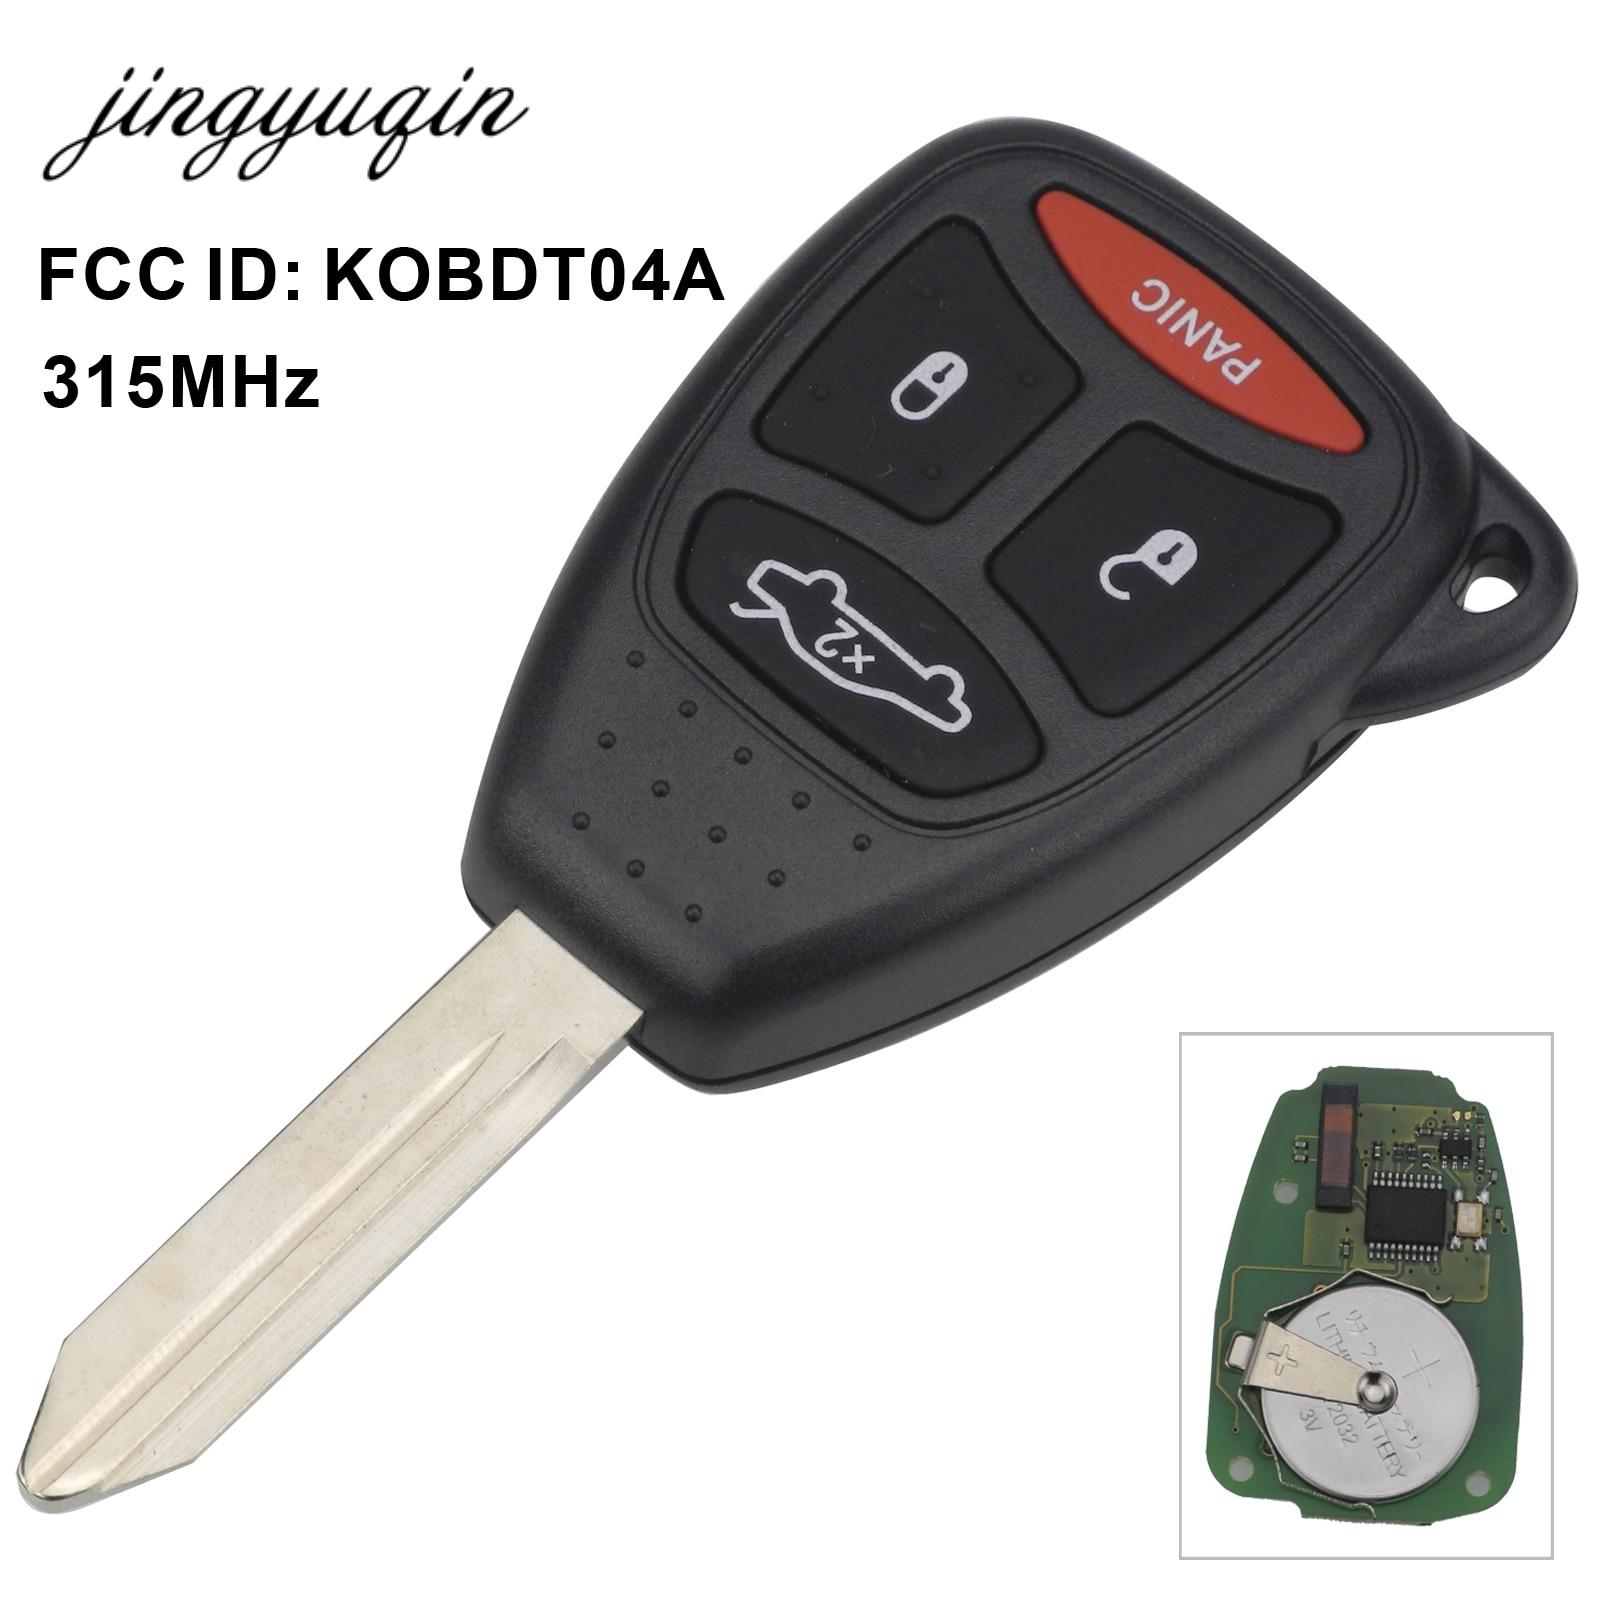 jingyuqin 315mhz KOBDT04A Remote Car key 3/4 Button for Dodge Chrysler Jeep Dakota Durango Charger 300 Aspen Grand Cherokee dodge dakota durango 17x9 5 double spokes factory oem wheel rim silver remanufactured